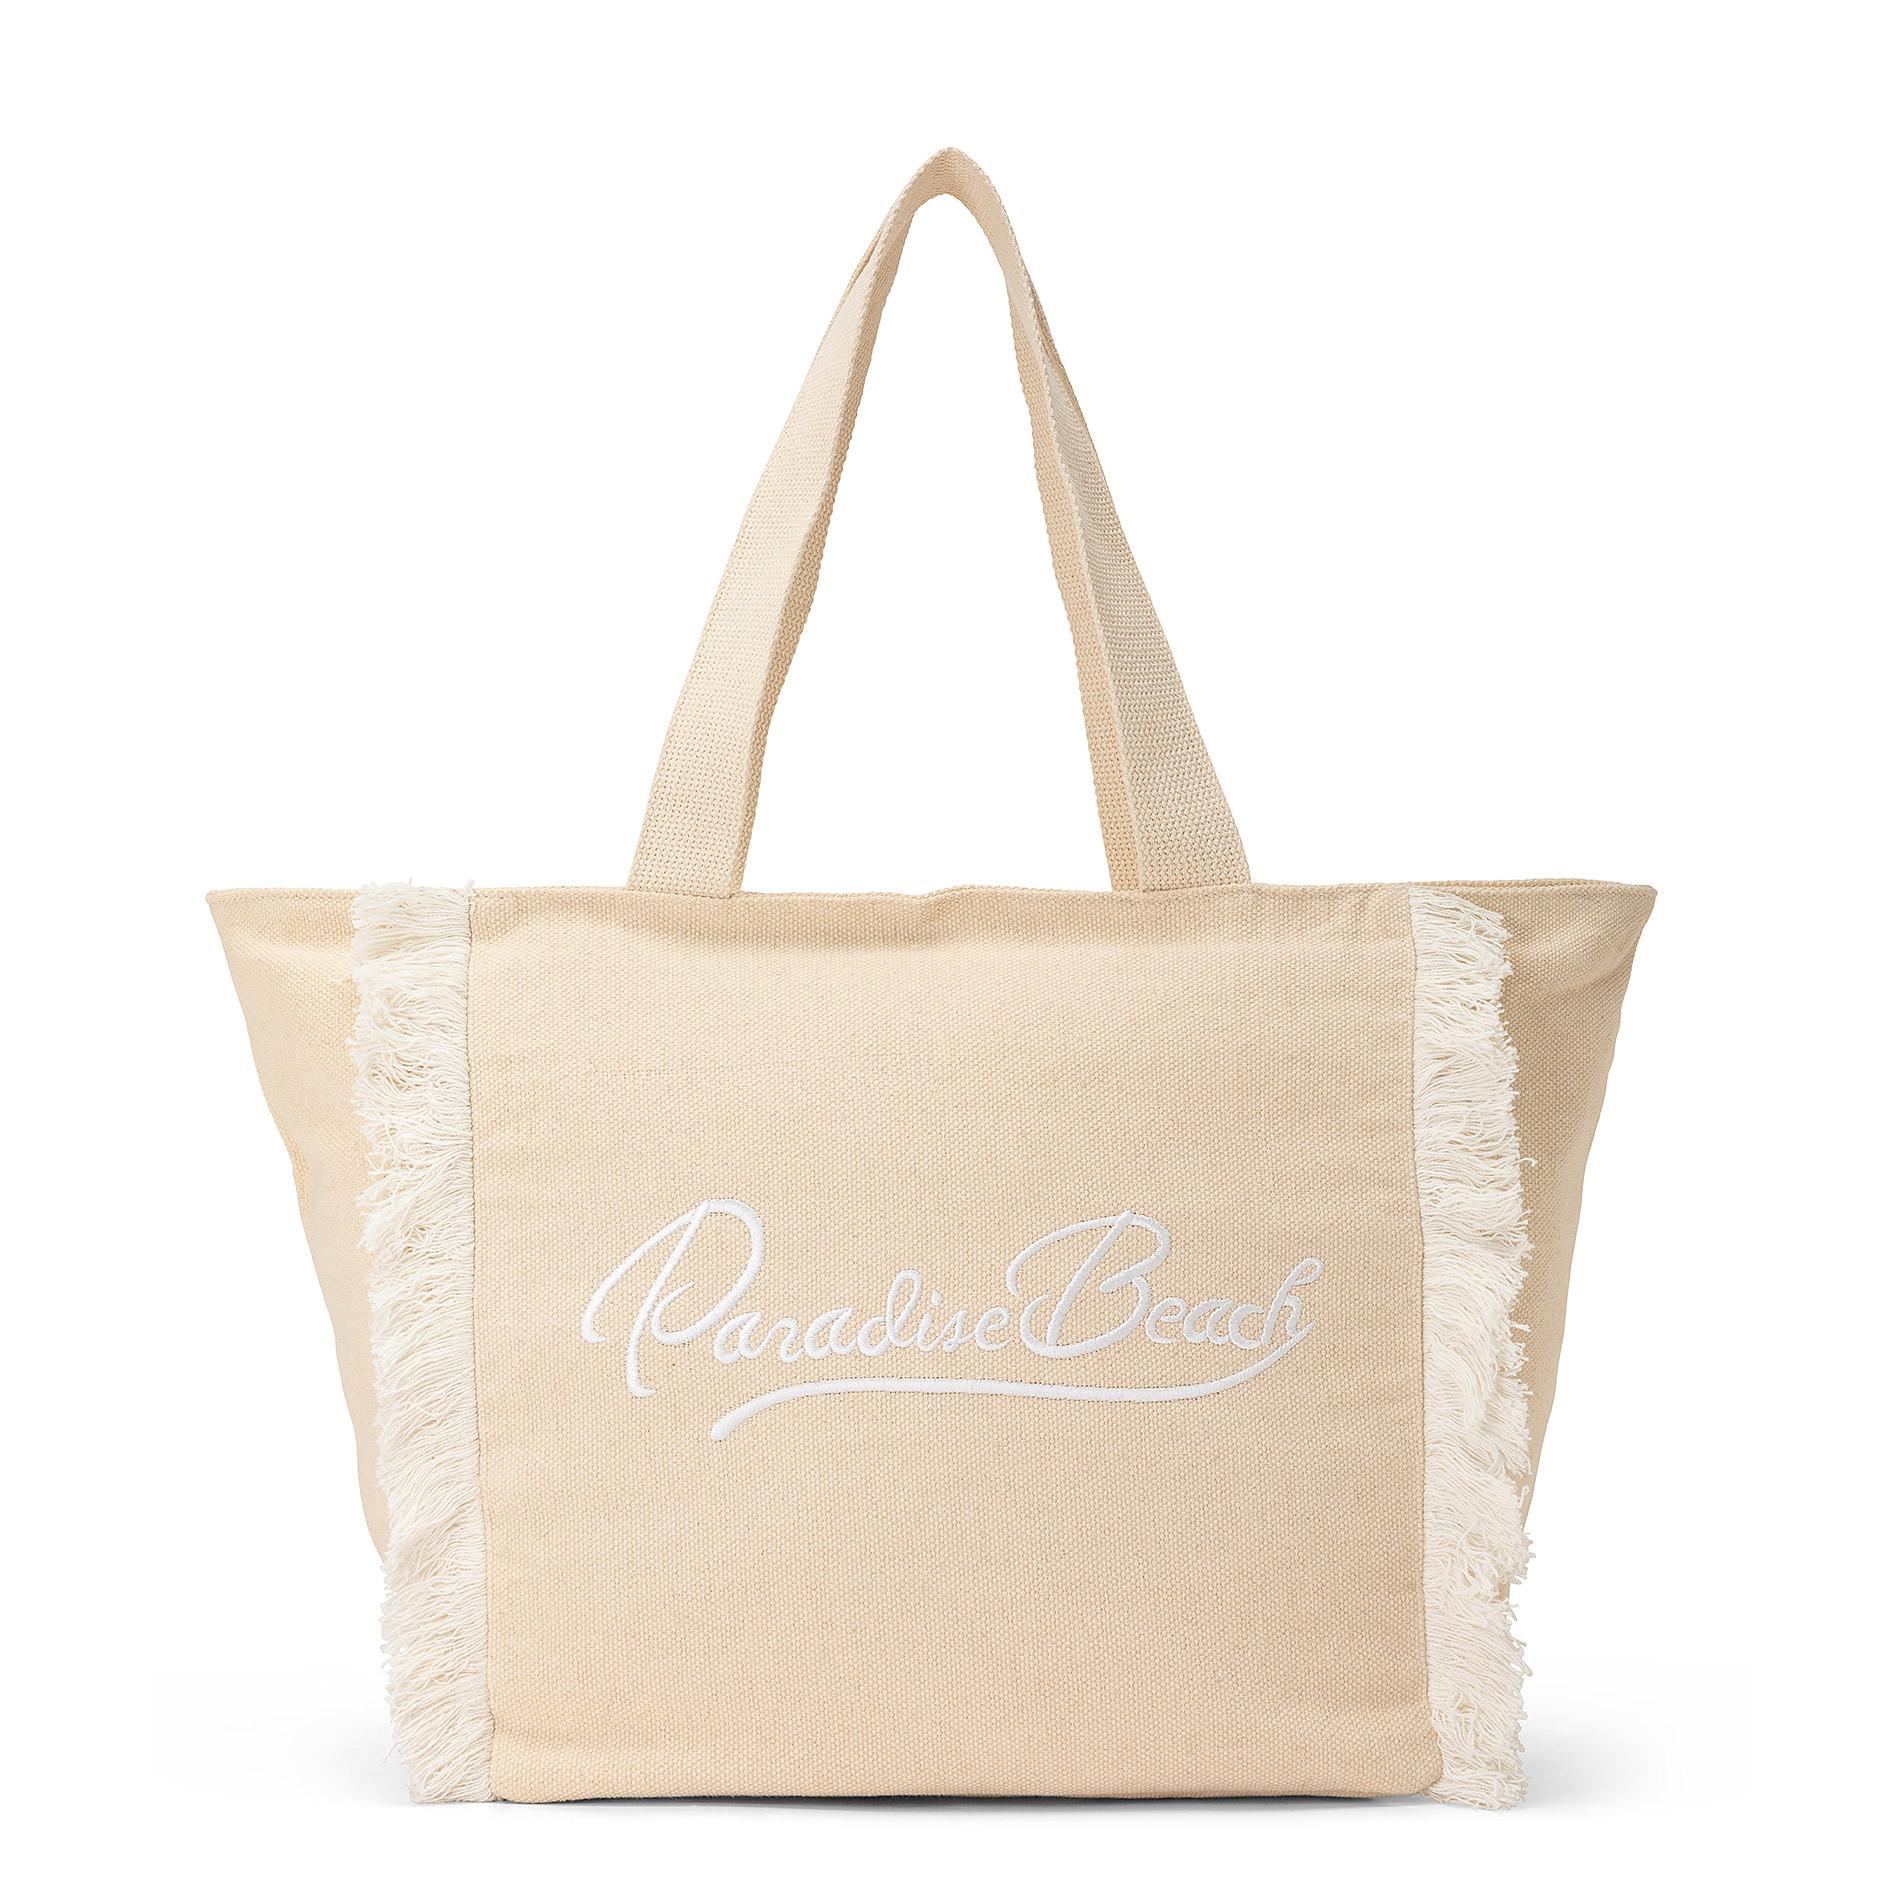 Shopper in canvas di cotone con ricamo, Beige, large image number 0